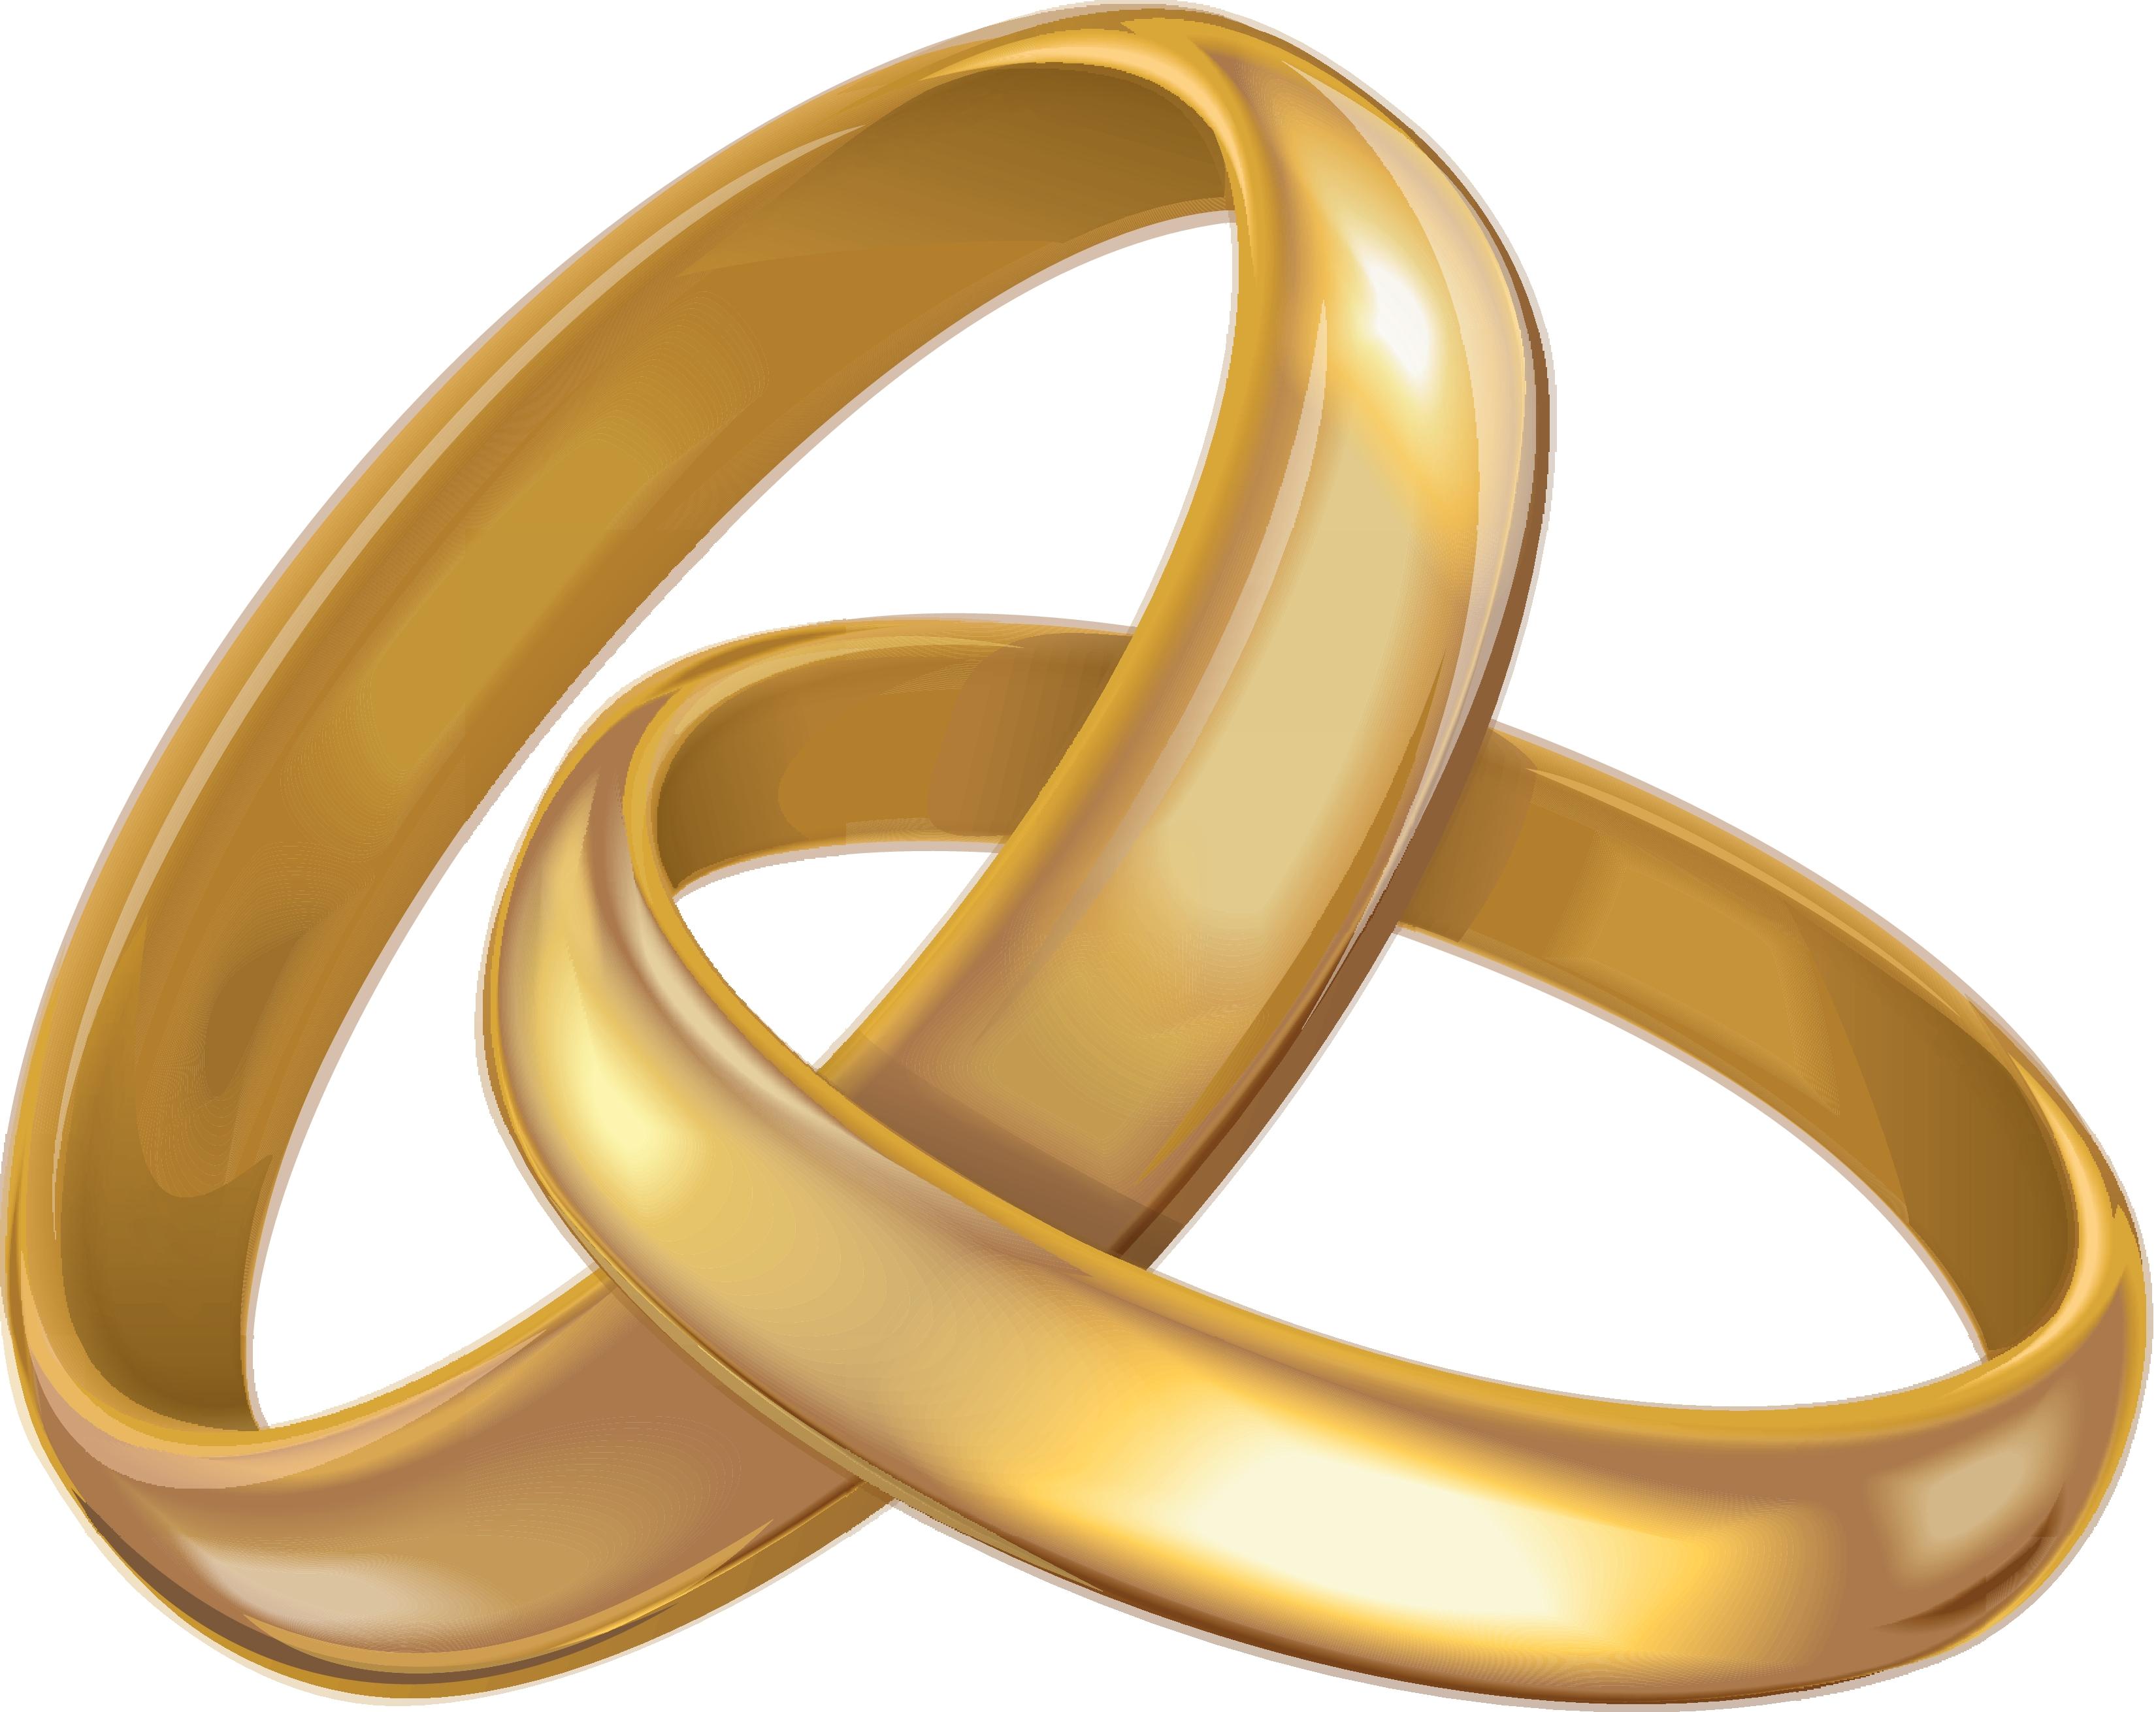 Clip art of gold wedding bands.